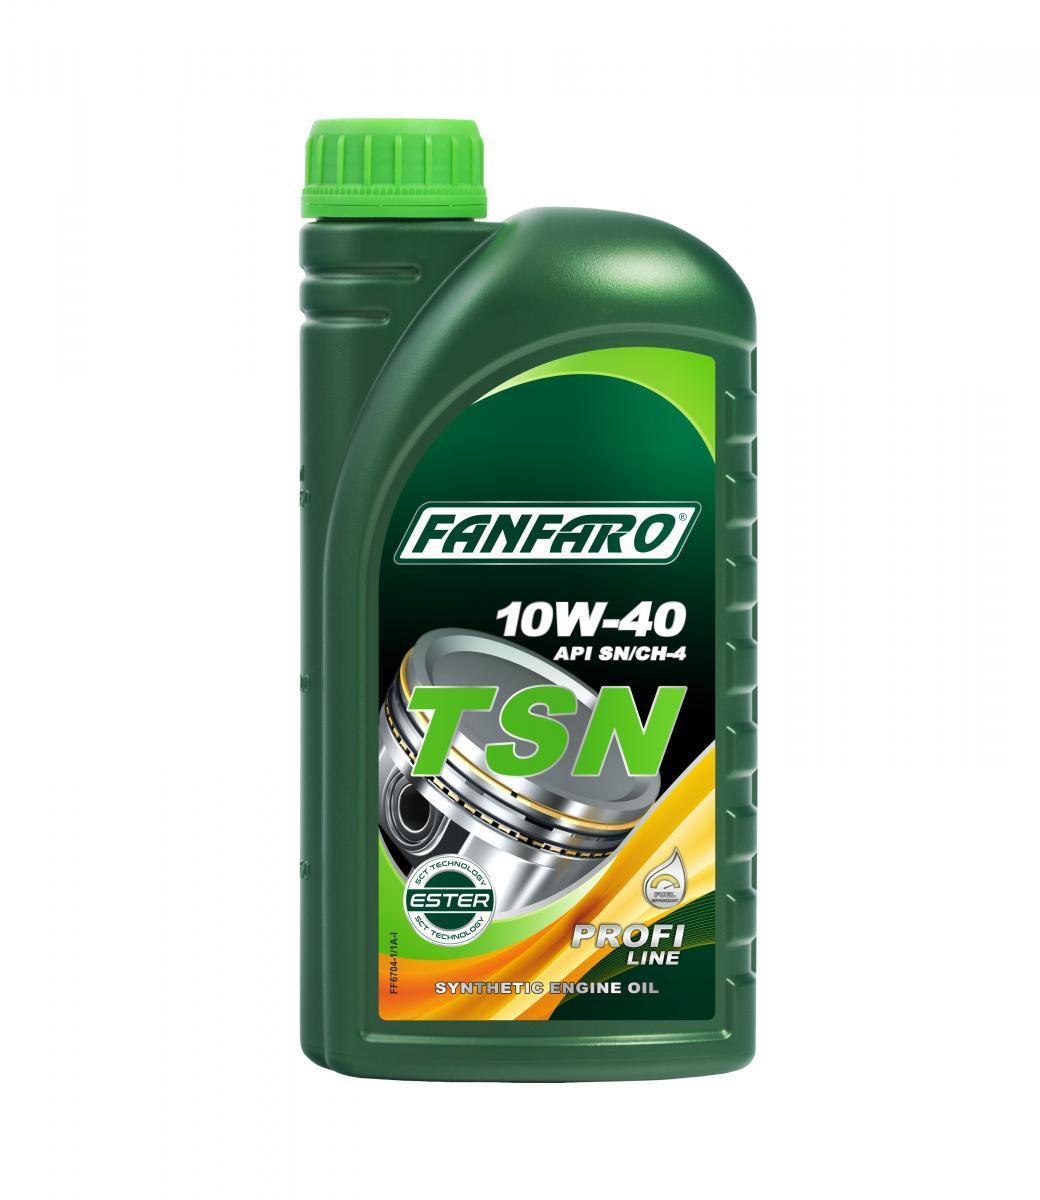 FF6704-1 FANFARO Profi Line, TSN 10W-40, 1l, Synthetiköl Motoröl FF6704-1 günstig kaufen